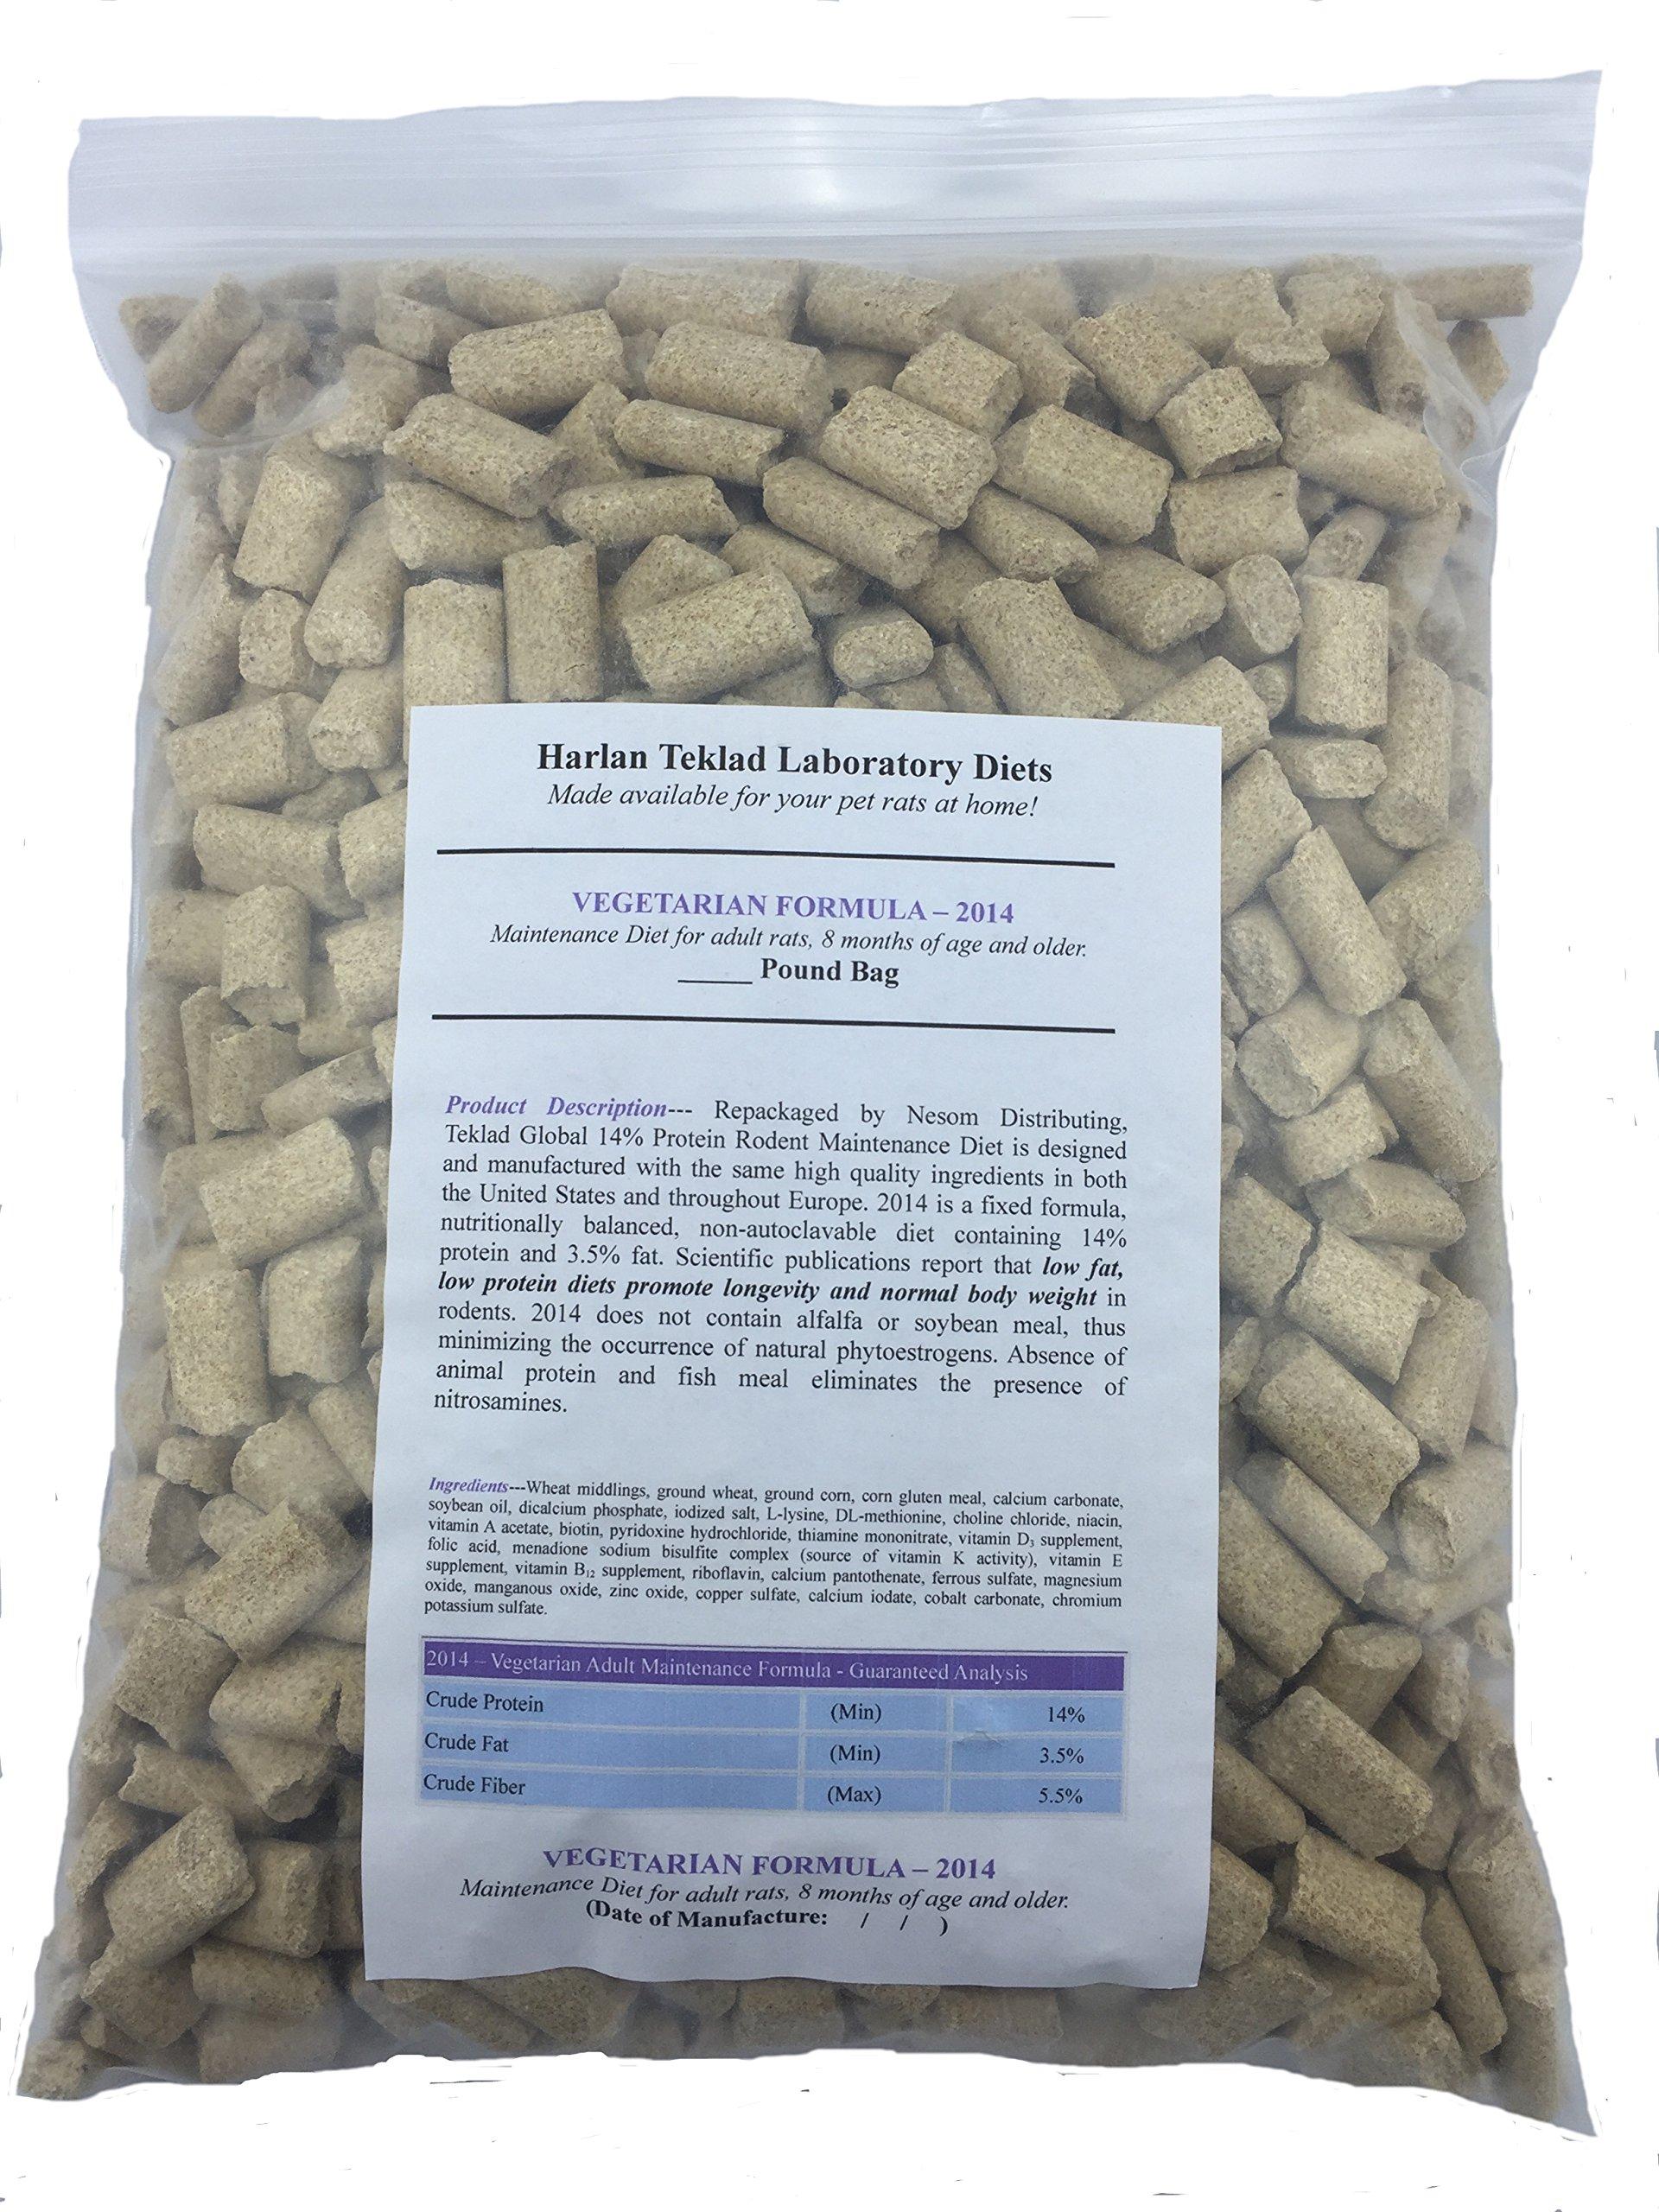 Nesom Distributing Envigo (Formerly Harlan) Teklad Adult Rat Food Diet Global 2014 (10lbs) by Nesom Distributing (Image #2)